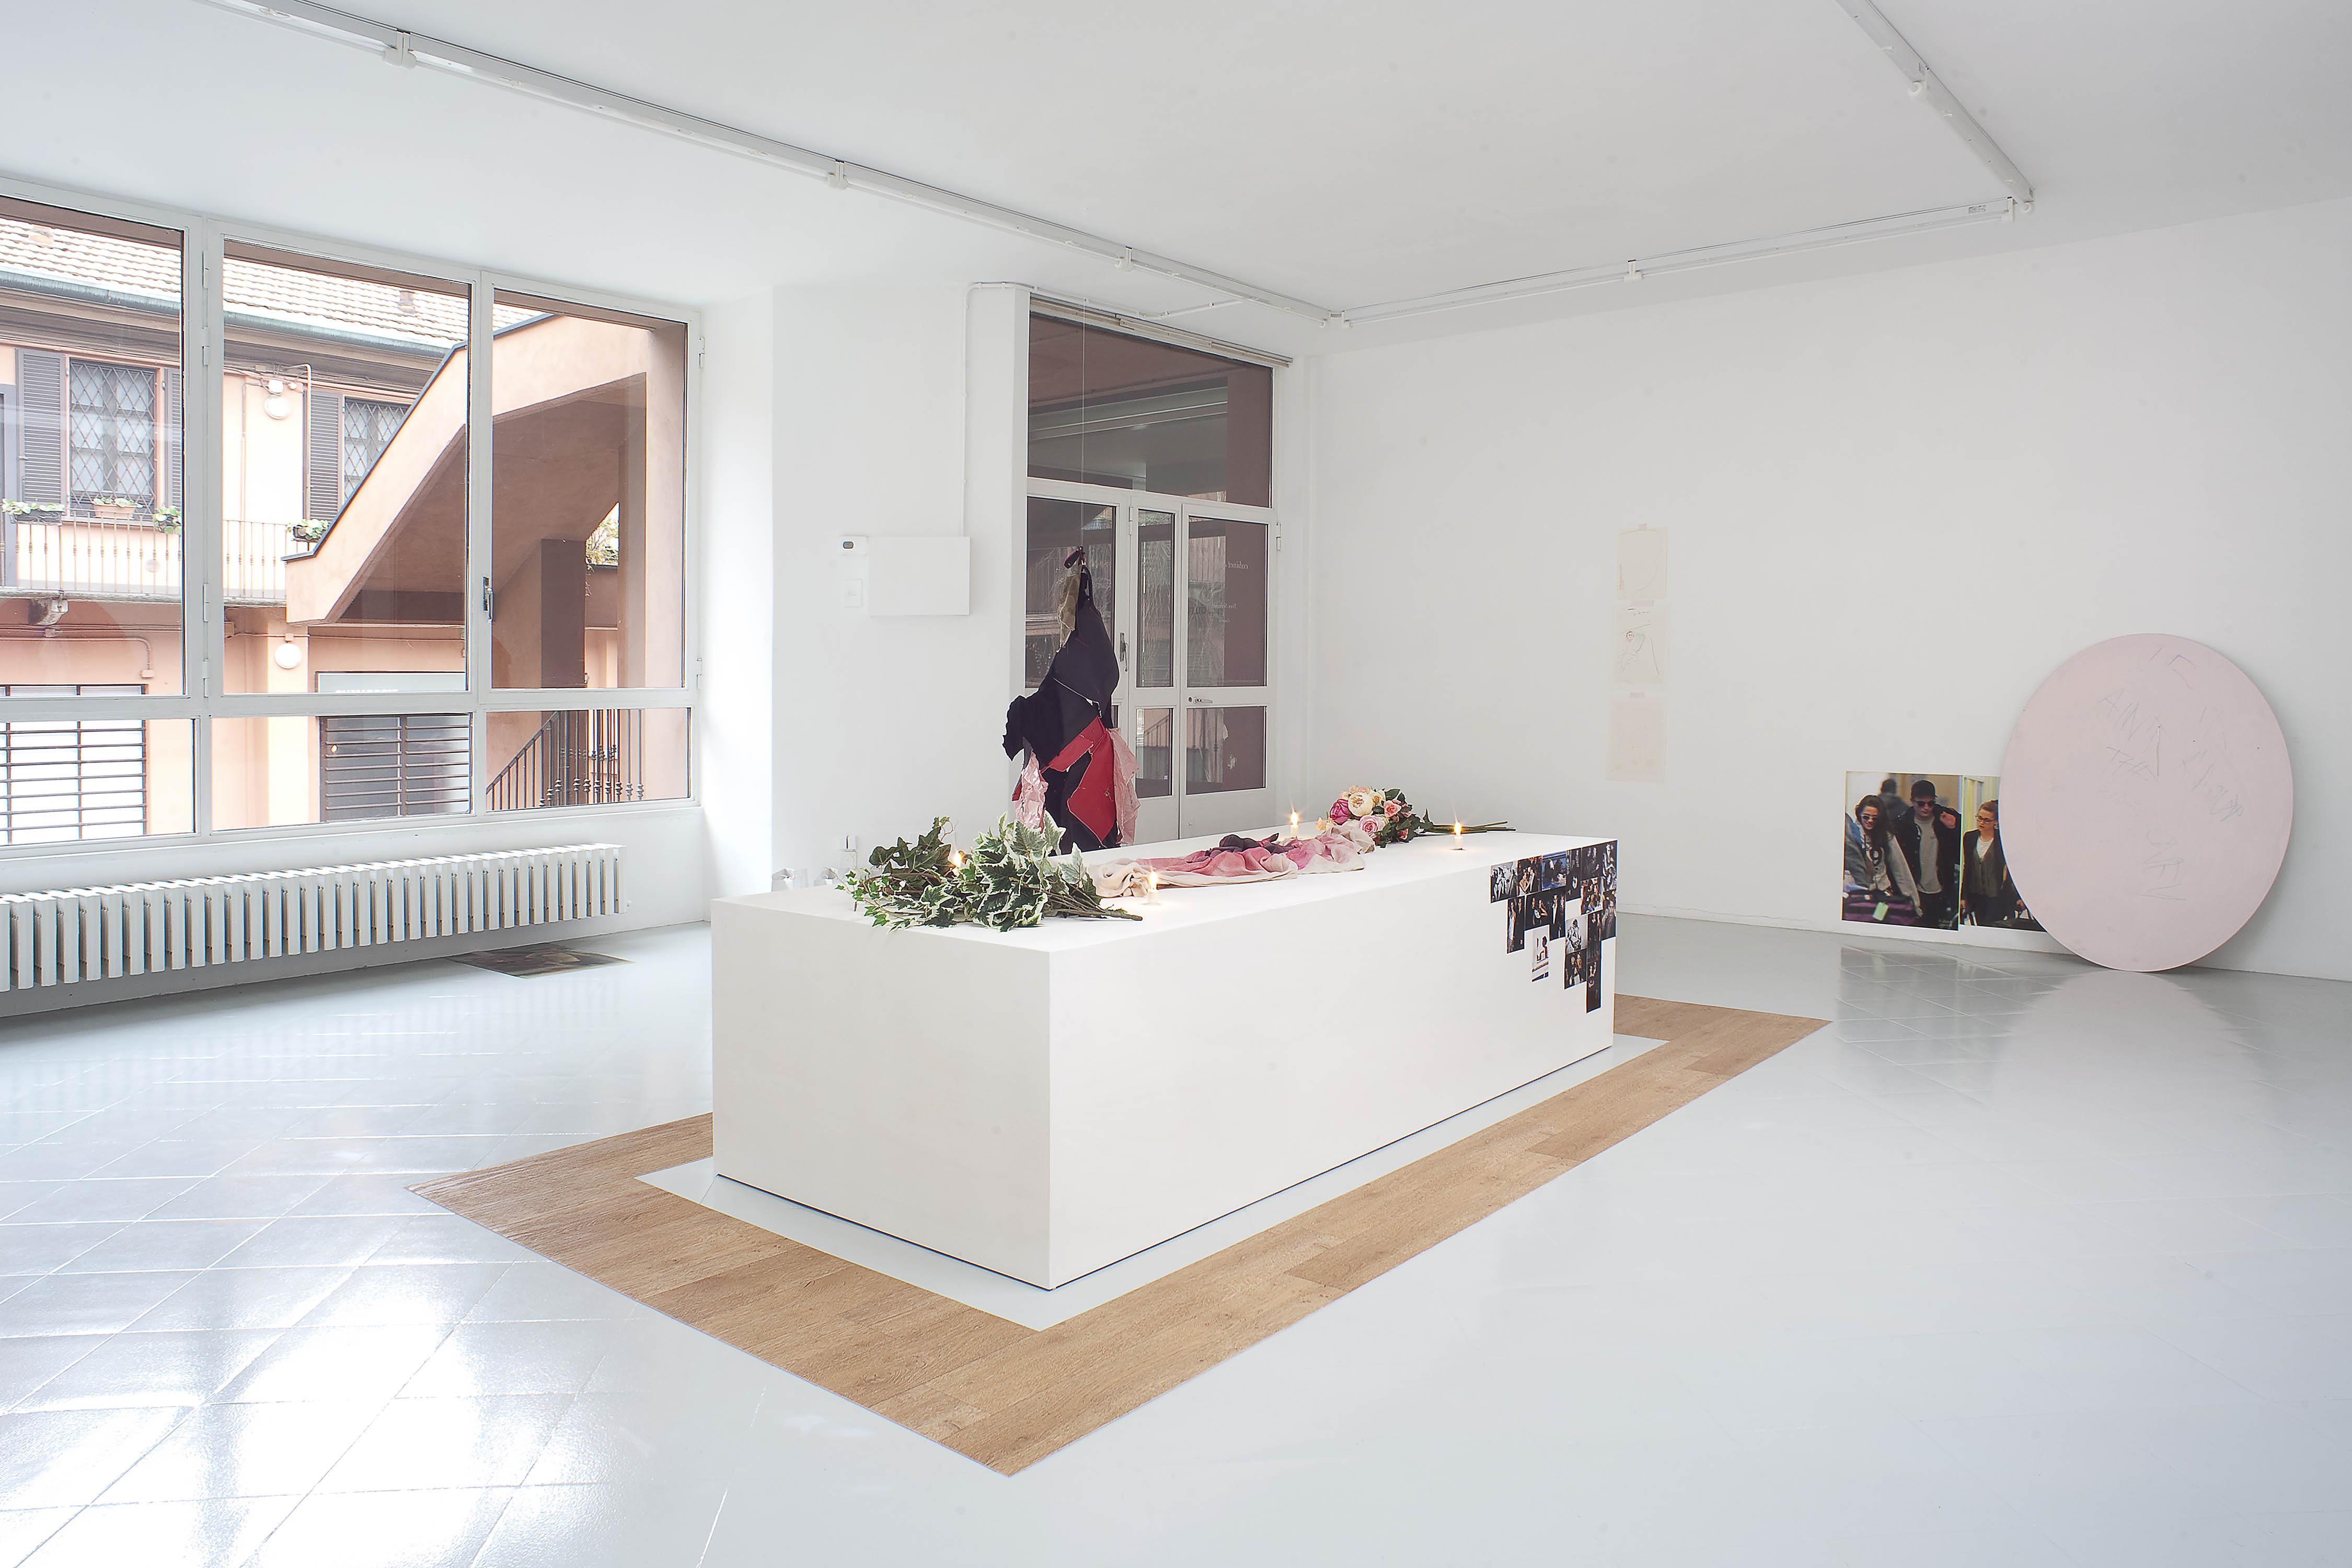 12 - Yves Scherer Installation view 2015 - Courtesy Studiolo Milan - Photo Filippo Armellin